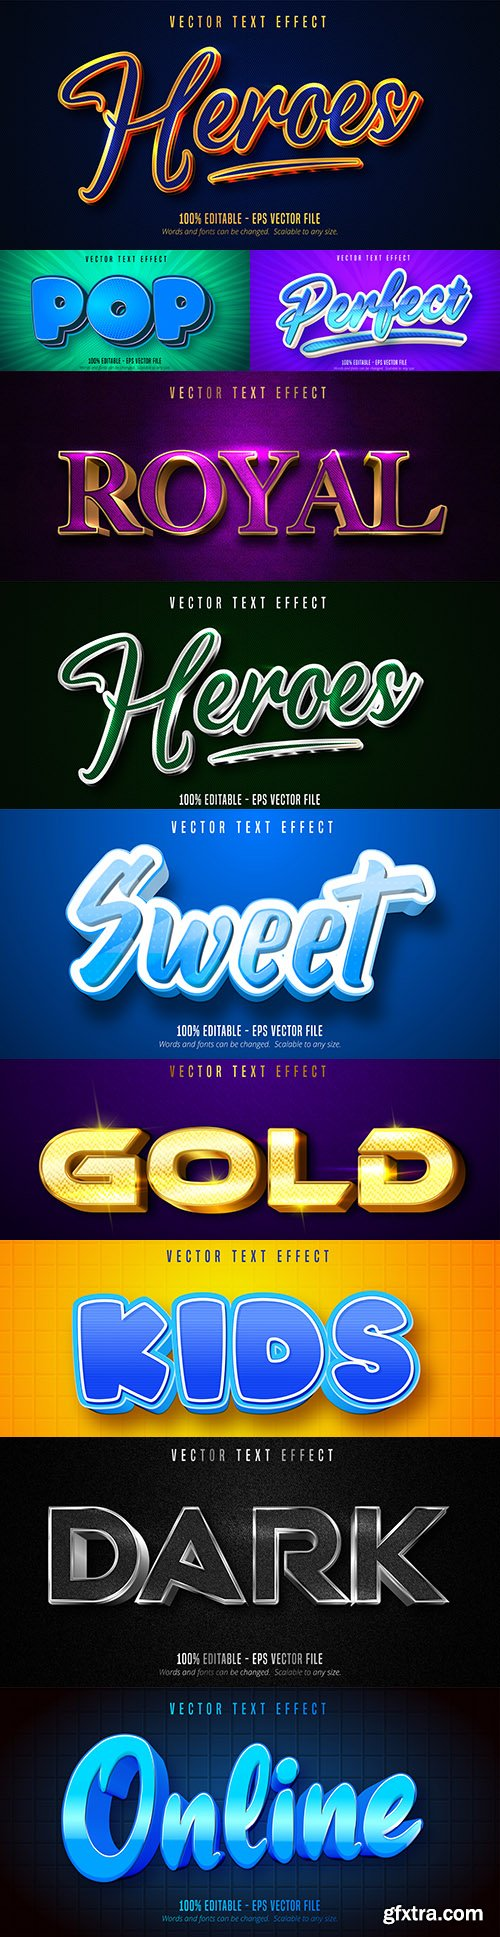 Editable font effect text collection illustration design 197